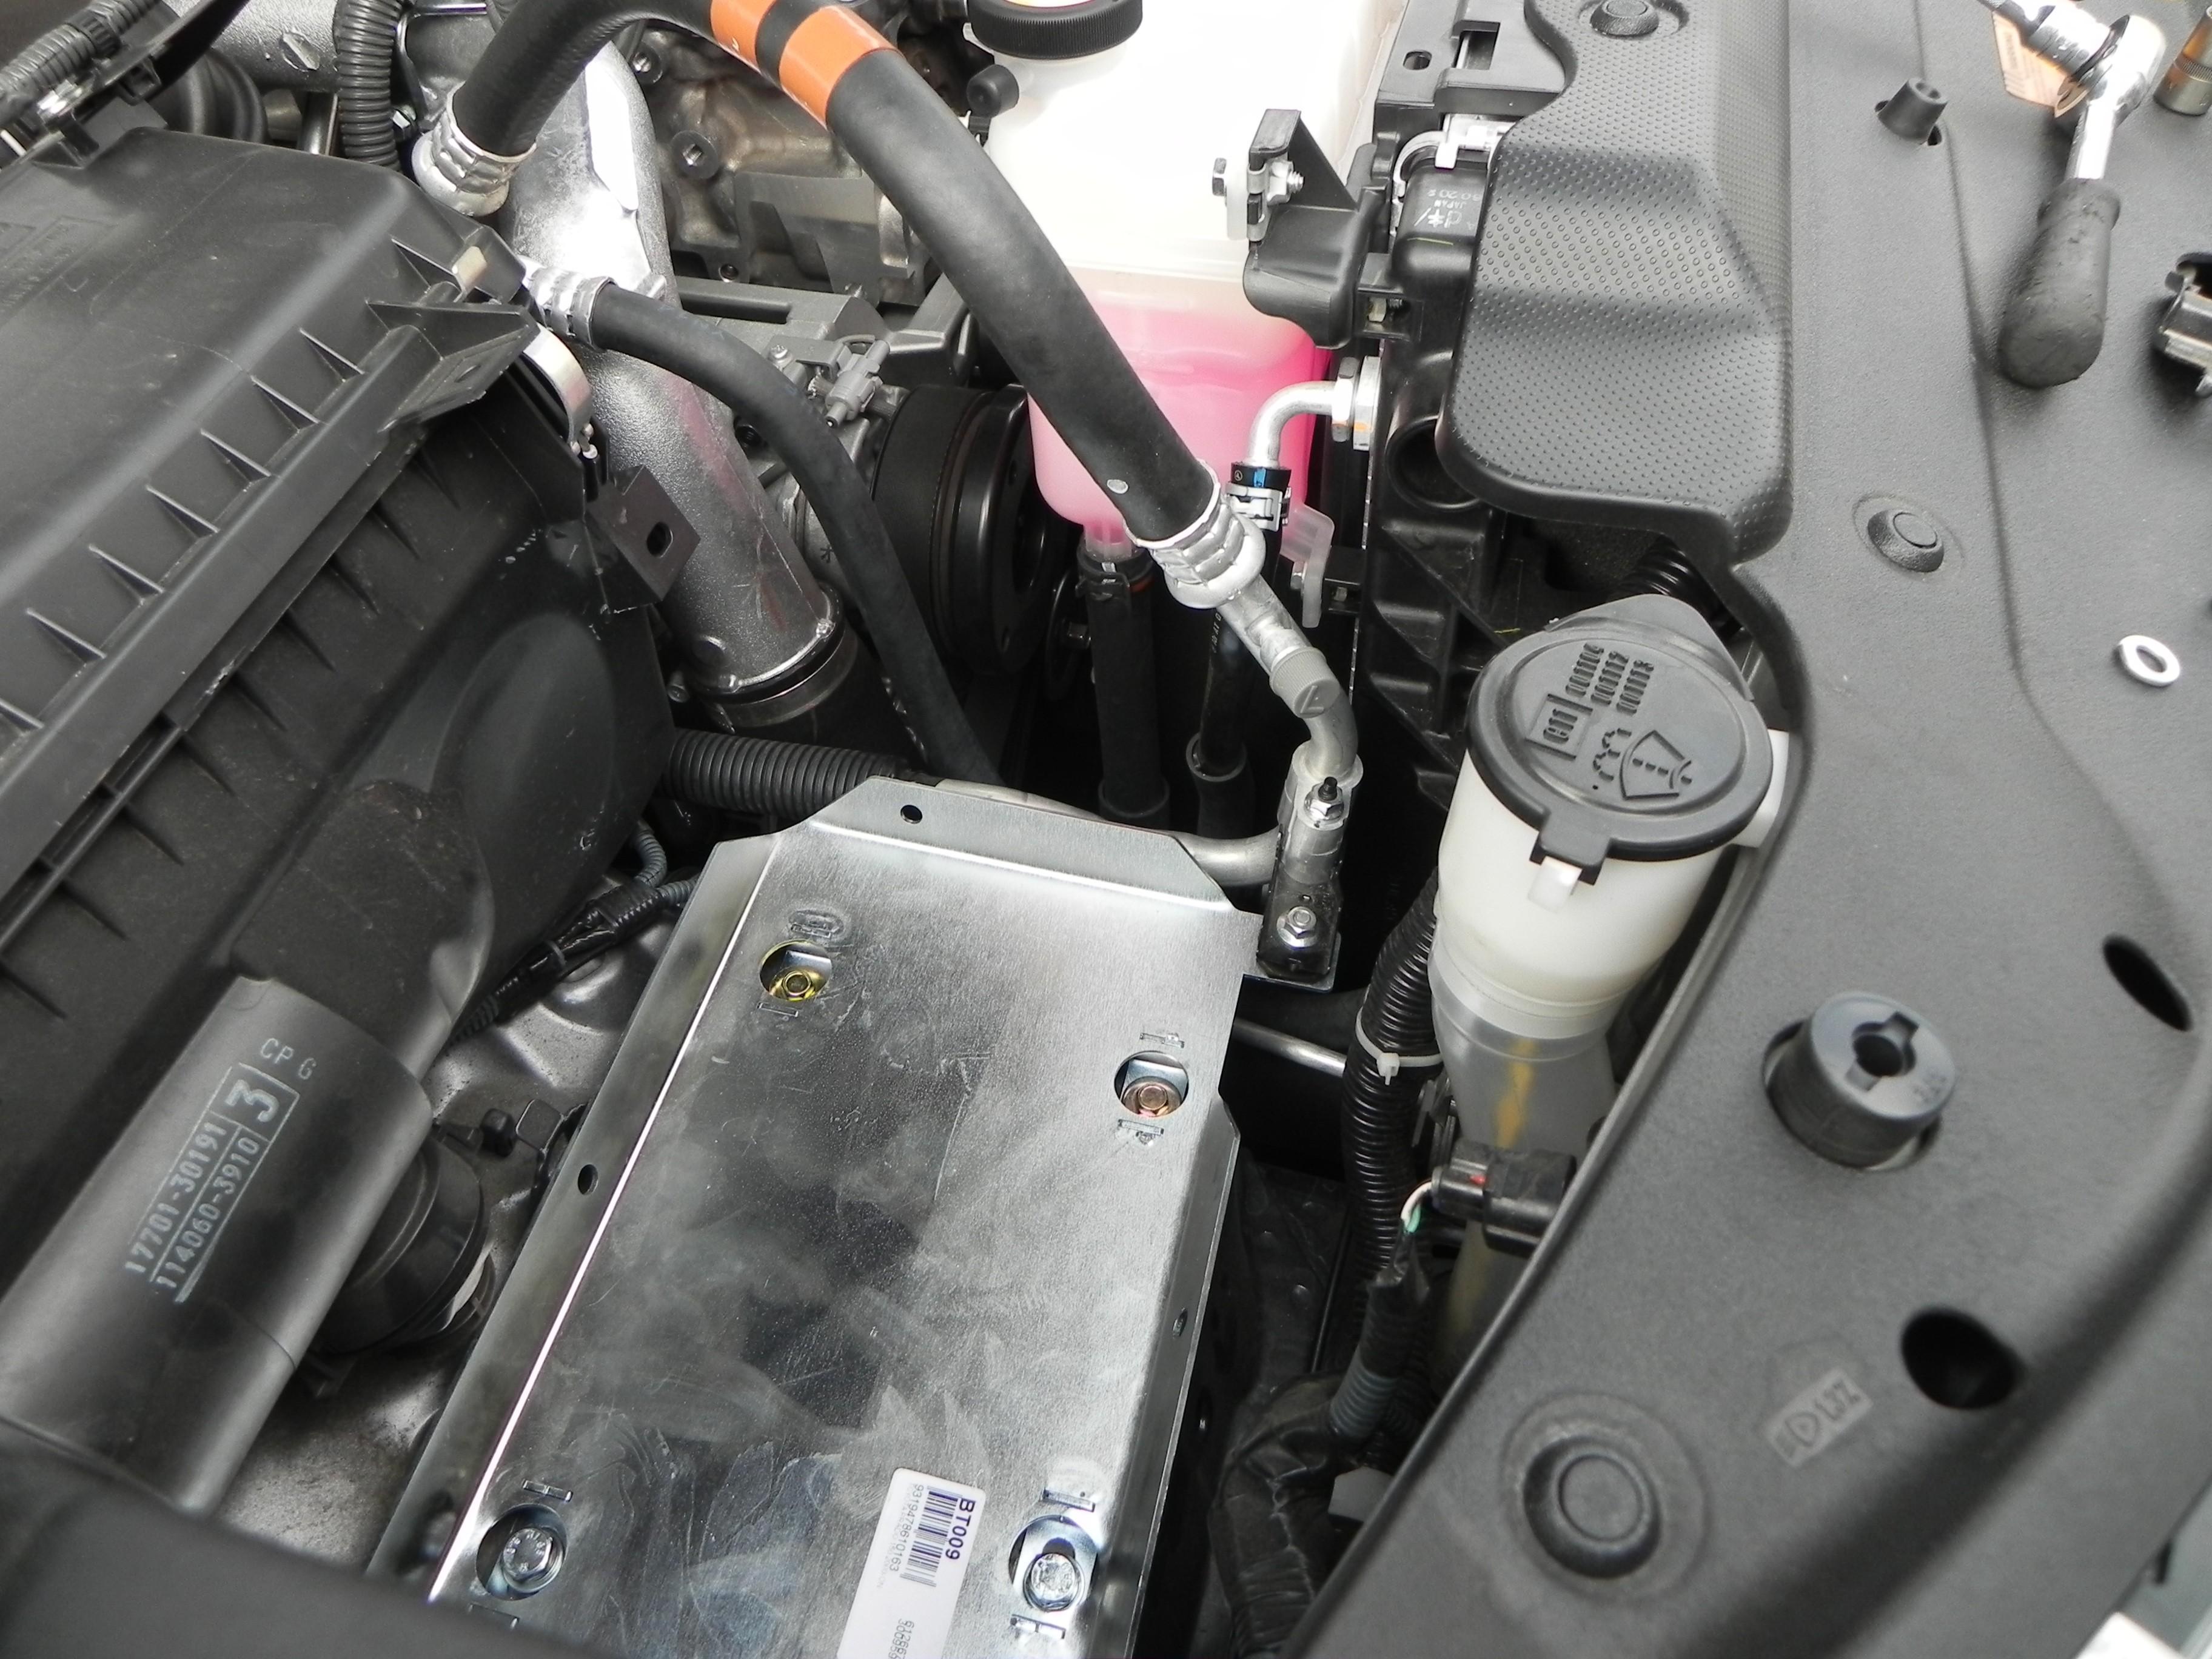 Roadsafe Toyota Prado 150 (Including Turbo Diesel) 2010-2013 BT009